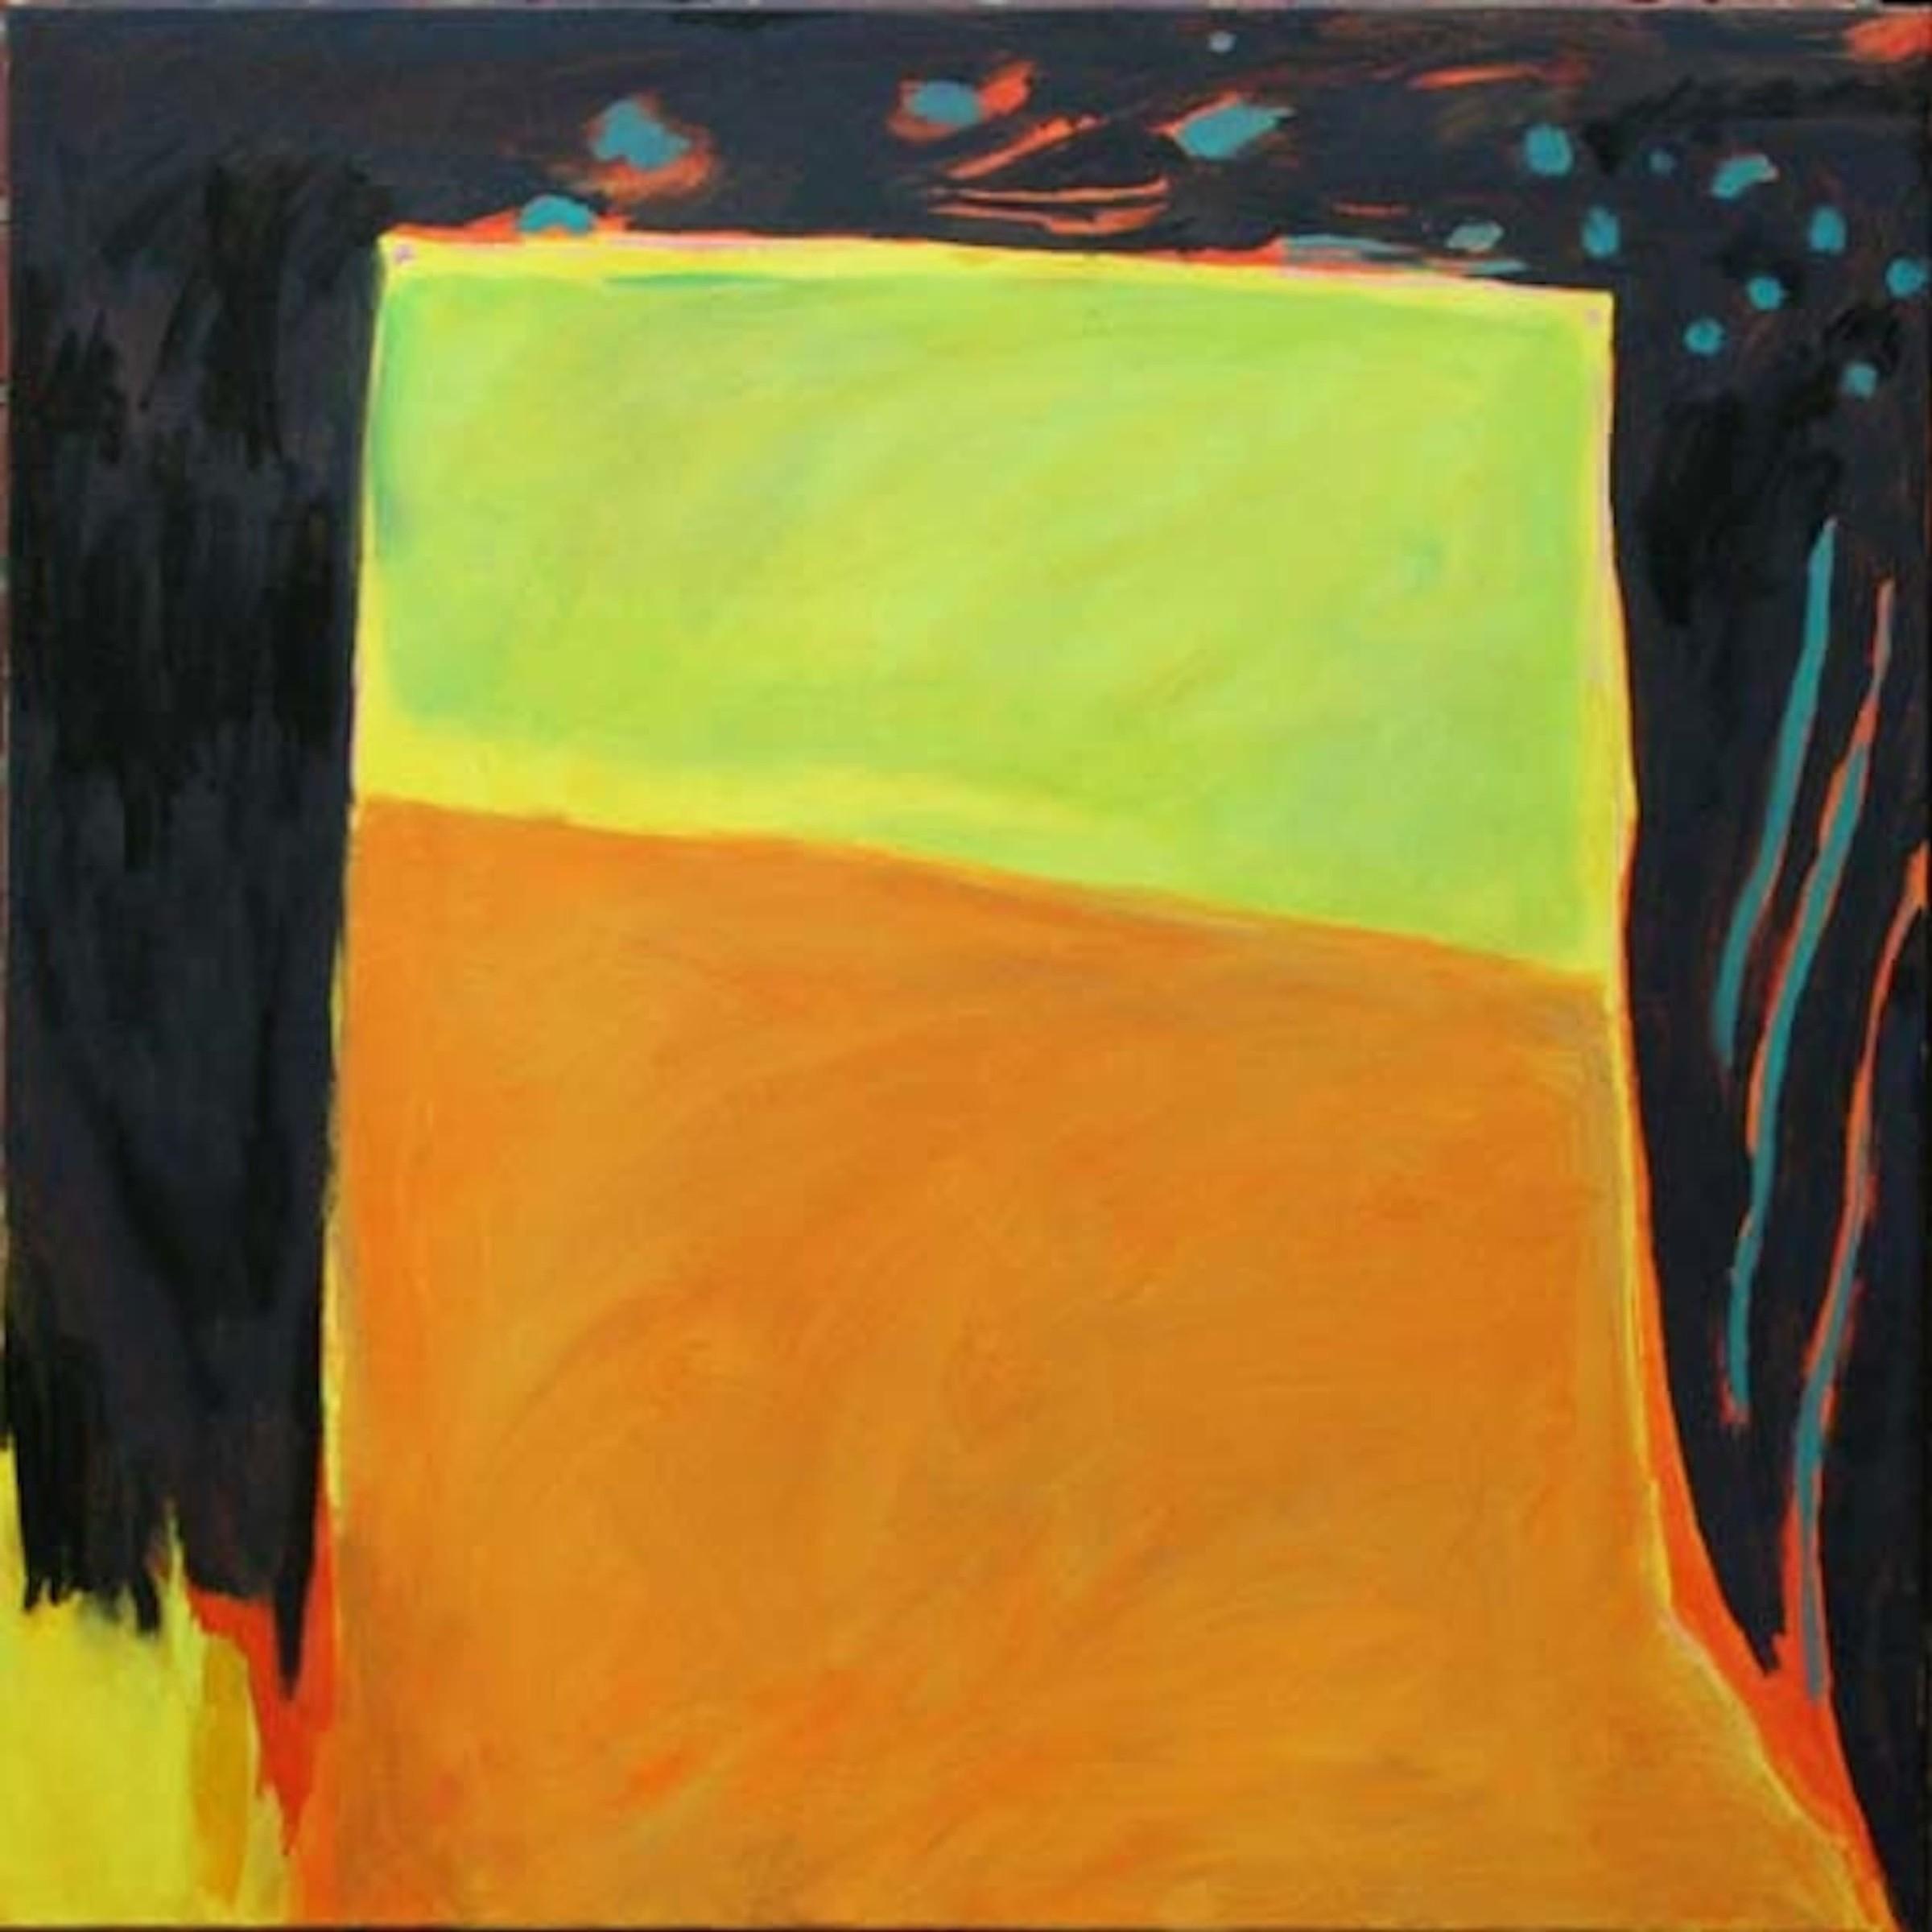 "<span class=""link fancybox-details-link""><a href=""/exhibitions/22/works/artworks_standalone11096/"">View Detail Page</a></span><div class=""artist""><span class=""artist""><strong>Ursula Leach RE</strong></span></div><div class=""title""><em>Field Margin</em></div><div class=""medium"">oil on canvas</div><div class=""dimensions"">76 x 76 cm</div>"